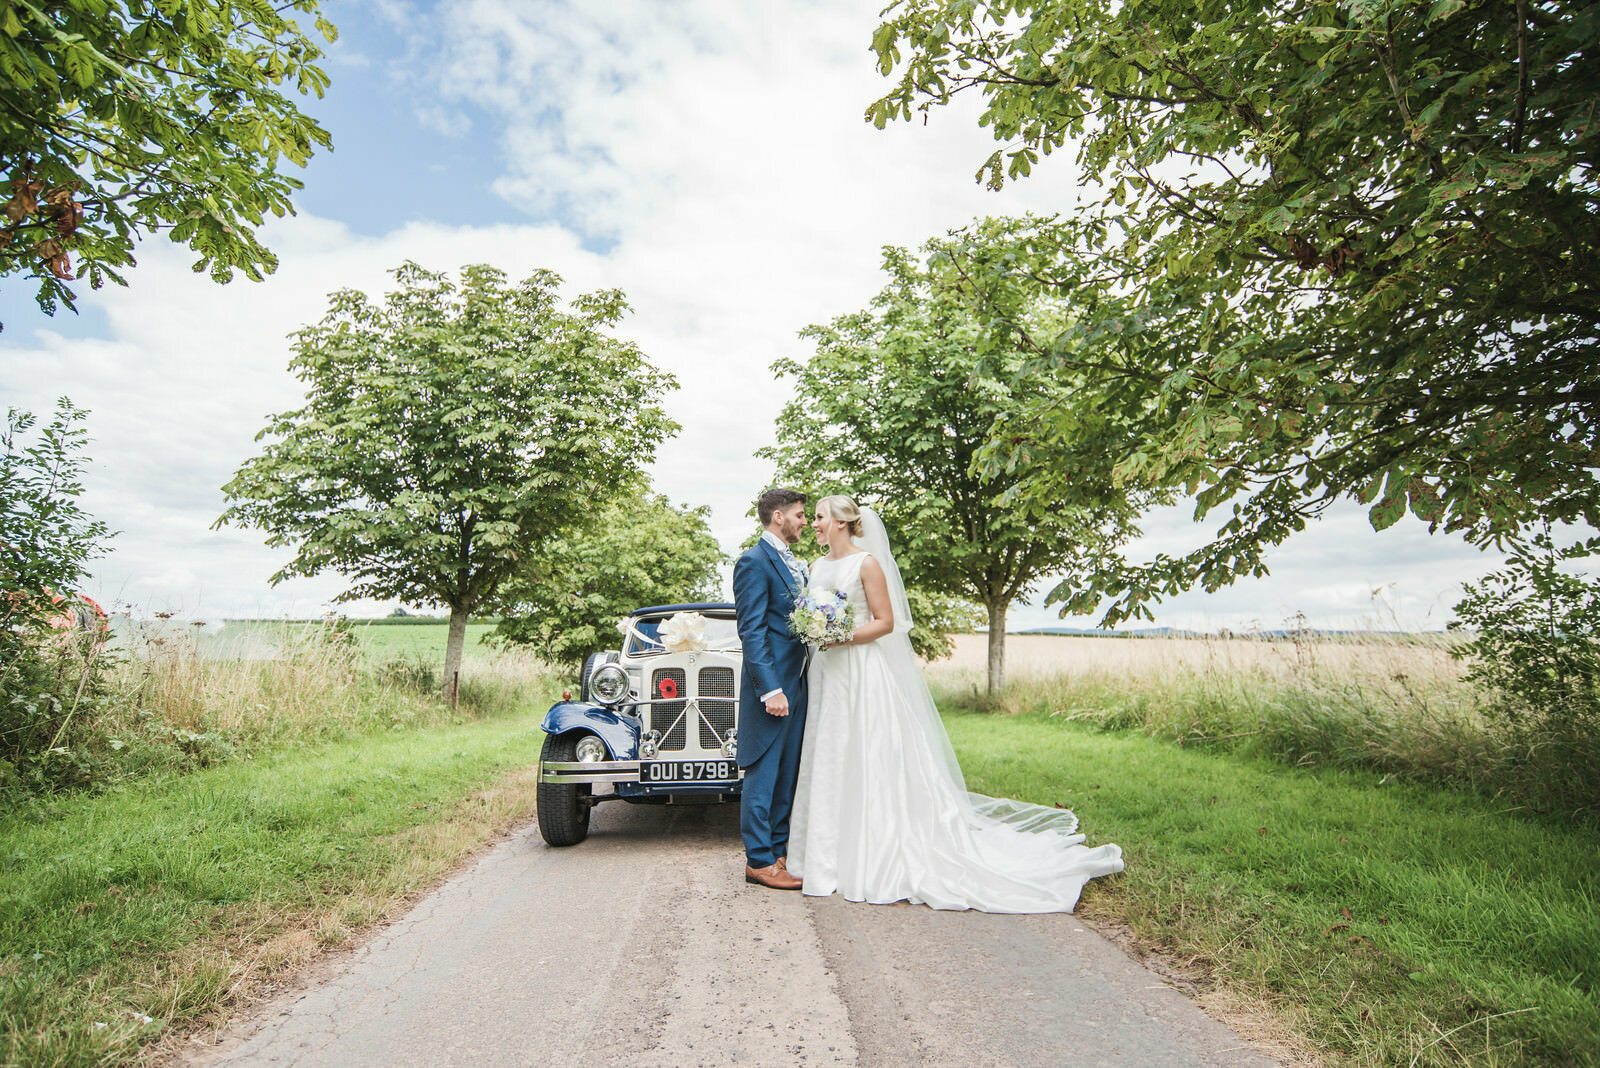 Lyde Arundel wedding photographer